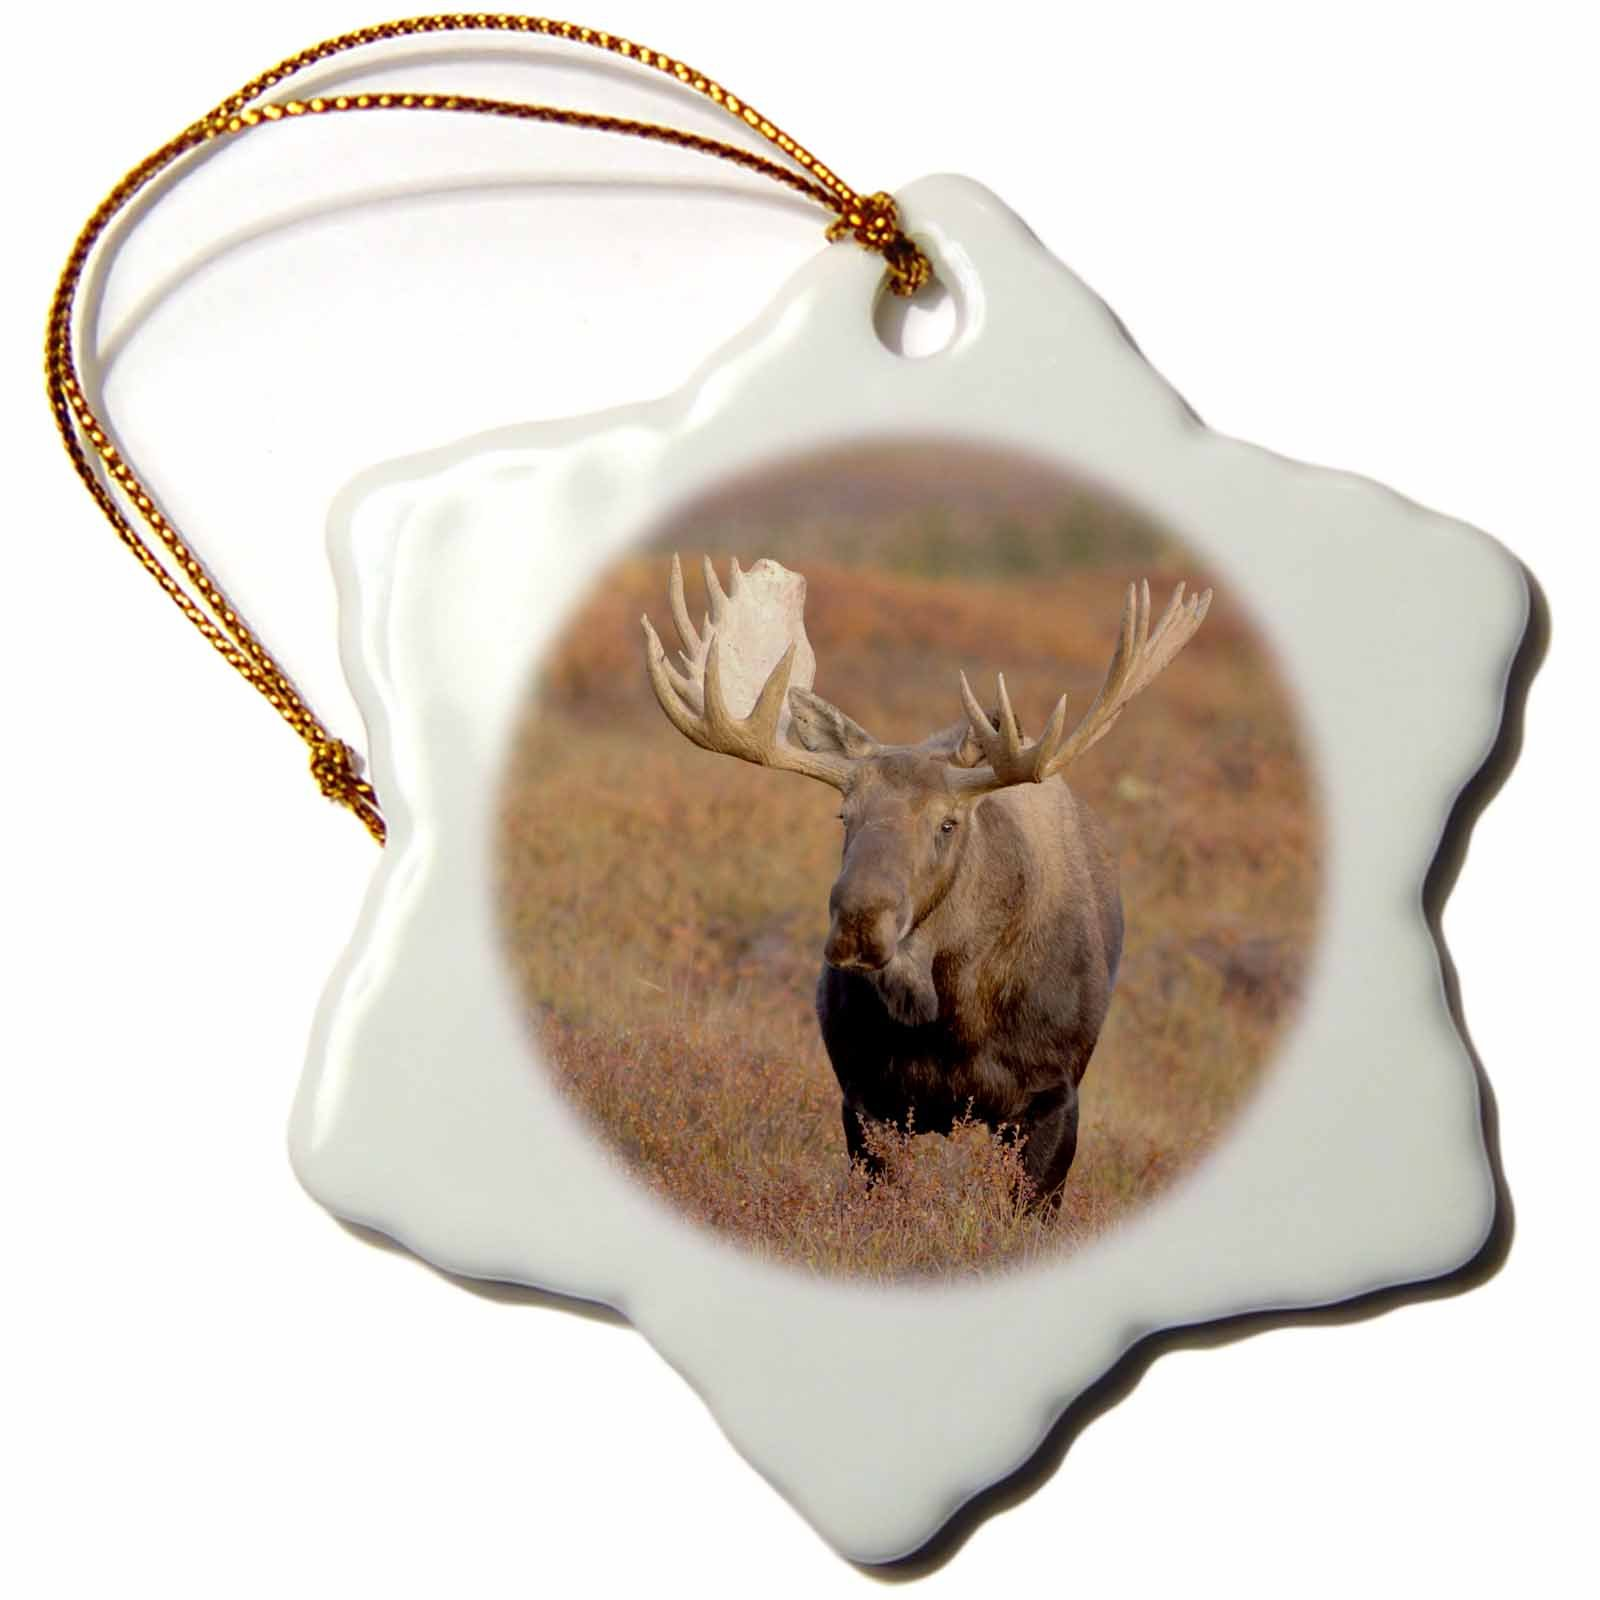 3dRose orn_87700_1 Moose bull wildlife, Denali National Park, Alaska - US02 SKA3060 - Steve Kazlowski - Snowflake Ornament, Porcelain, 3-Inch